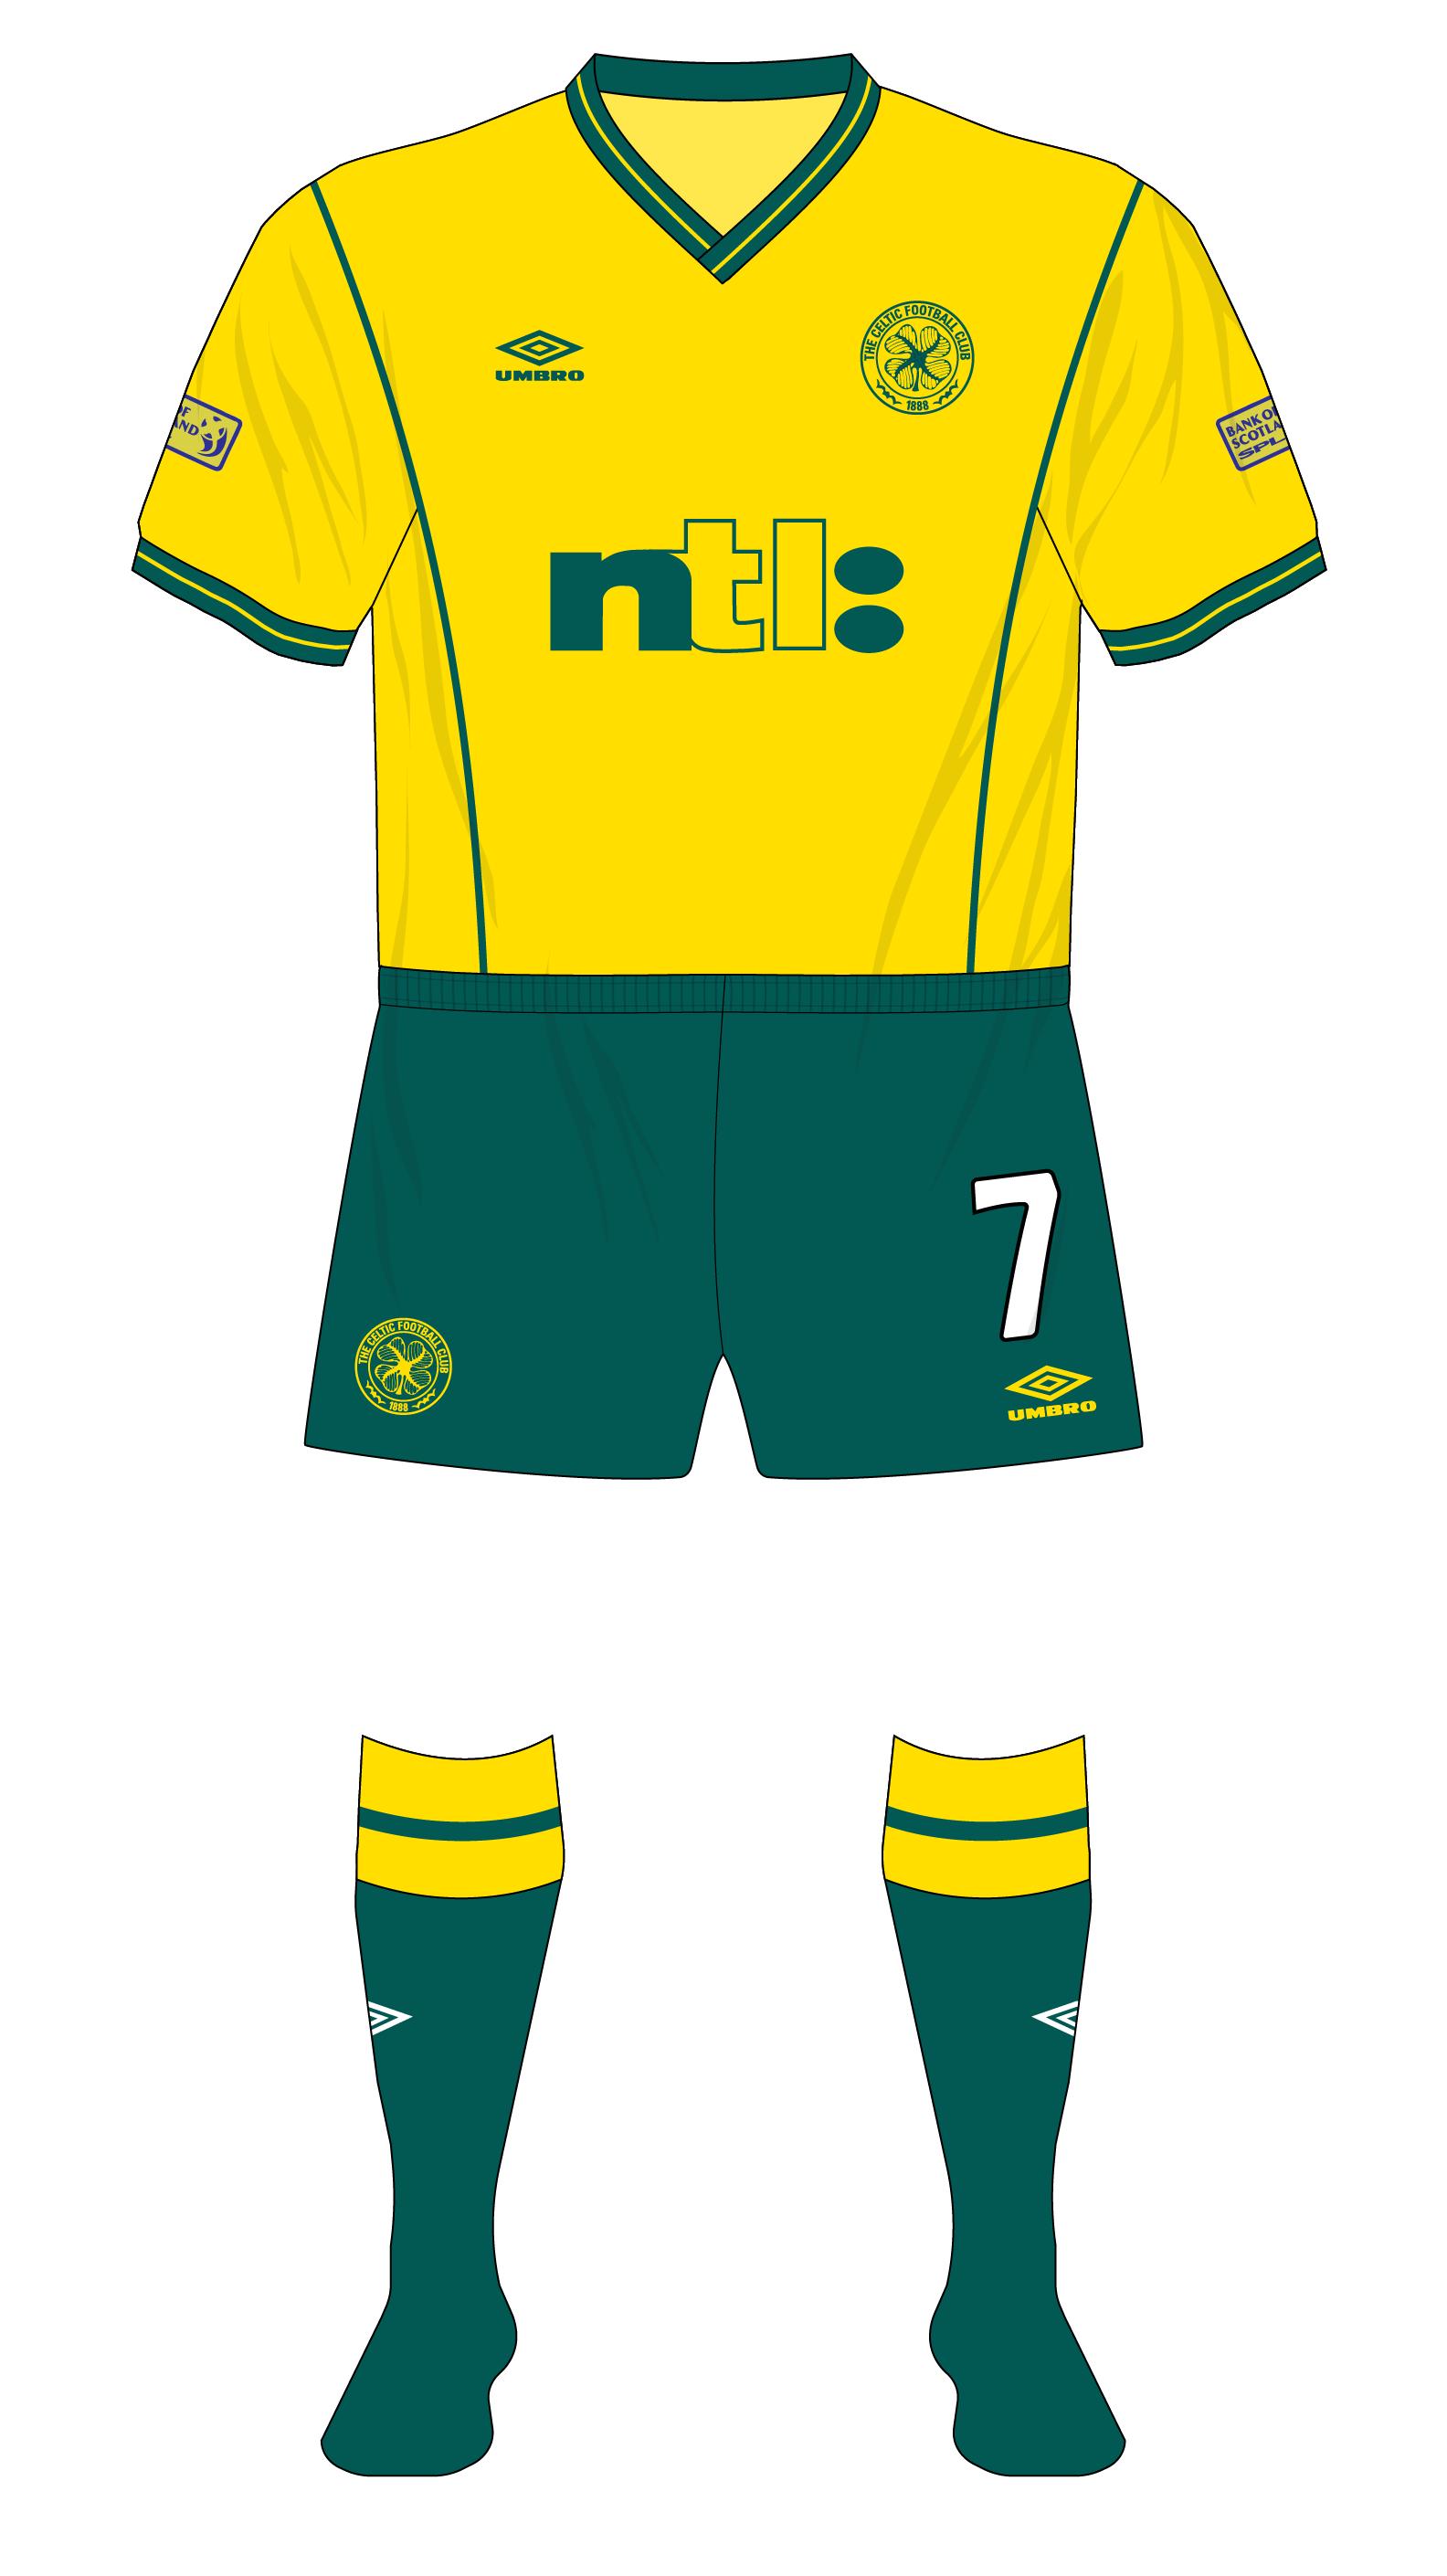 Celtic-2001-2002-Umbro-third-shirt-01